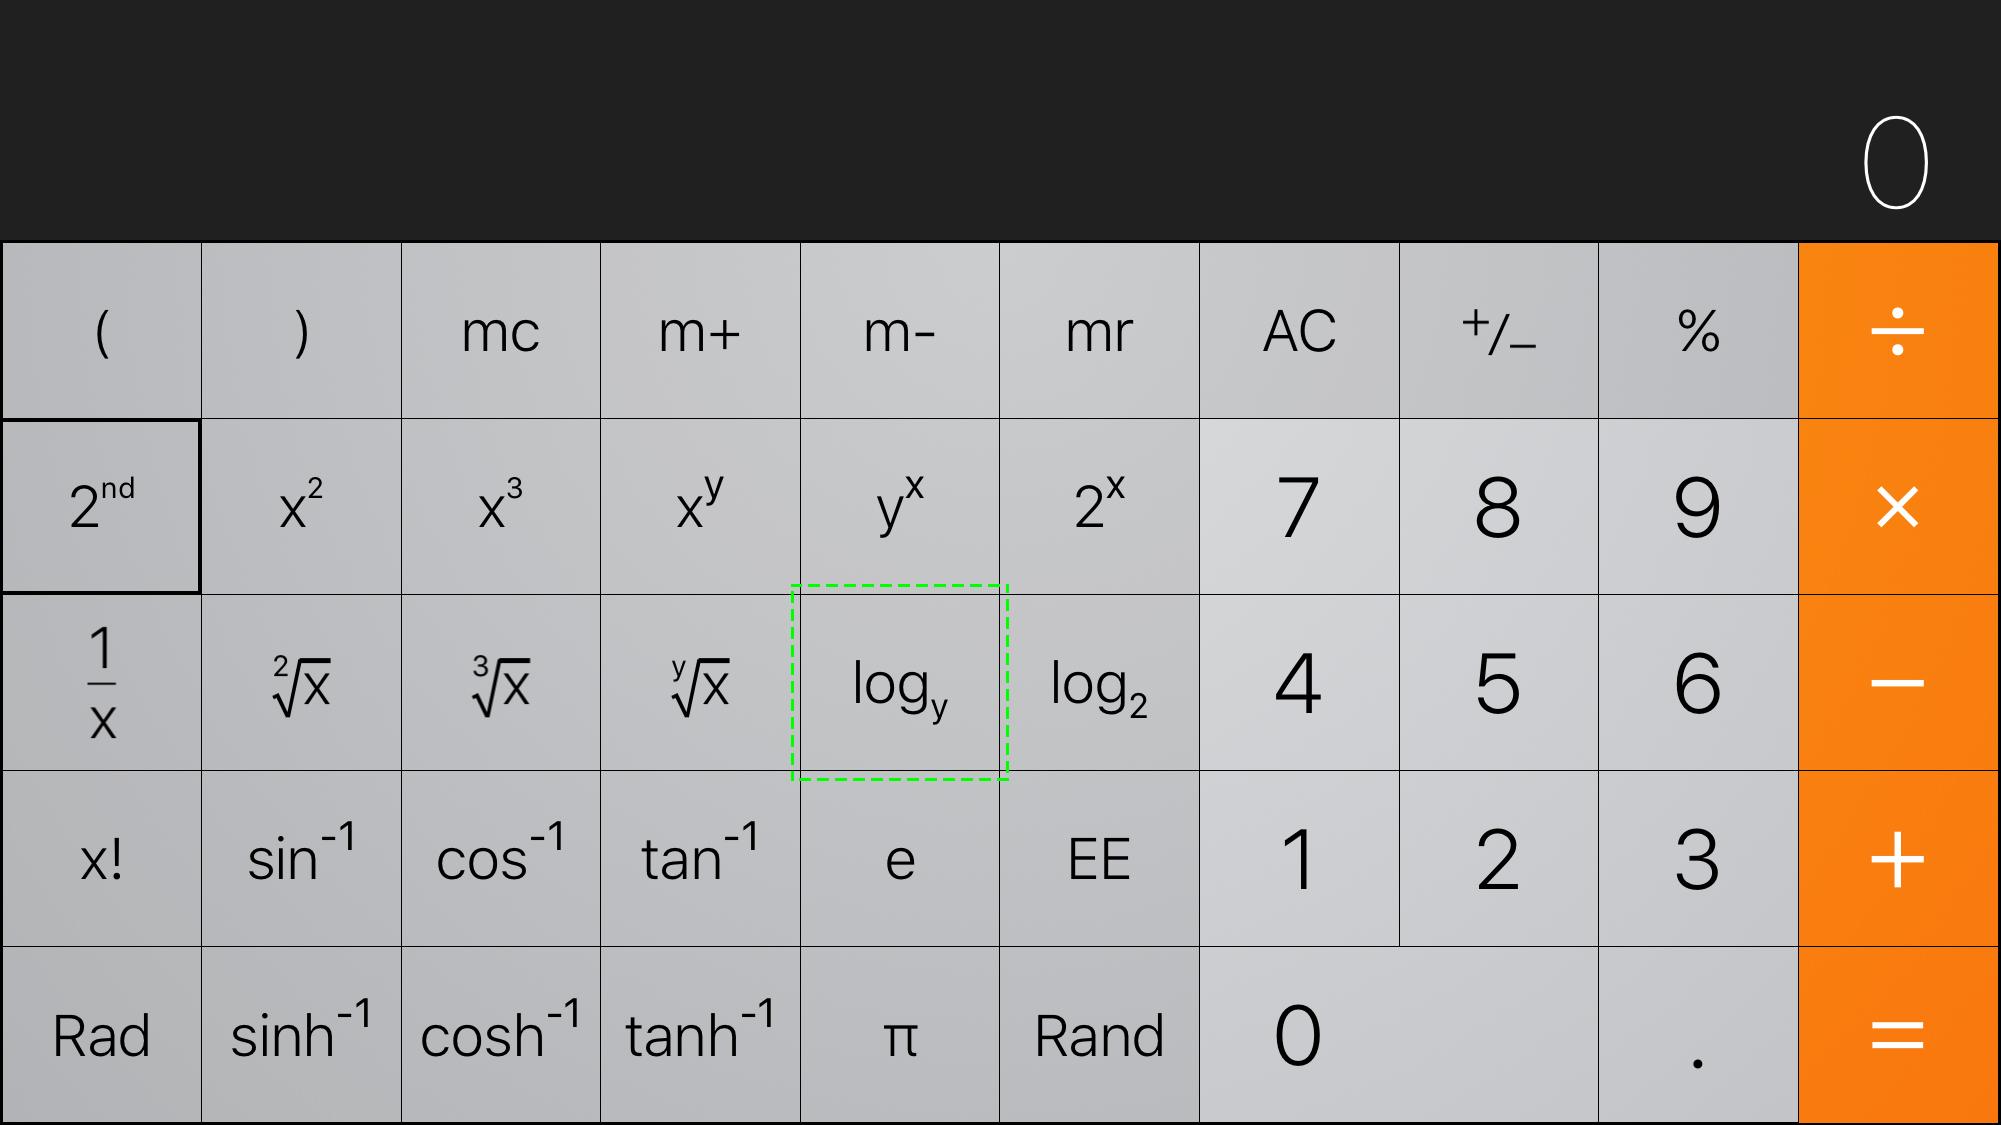 iPhone calculator manual? - Apple Community